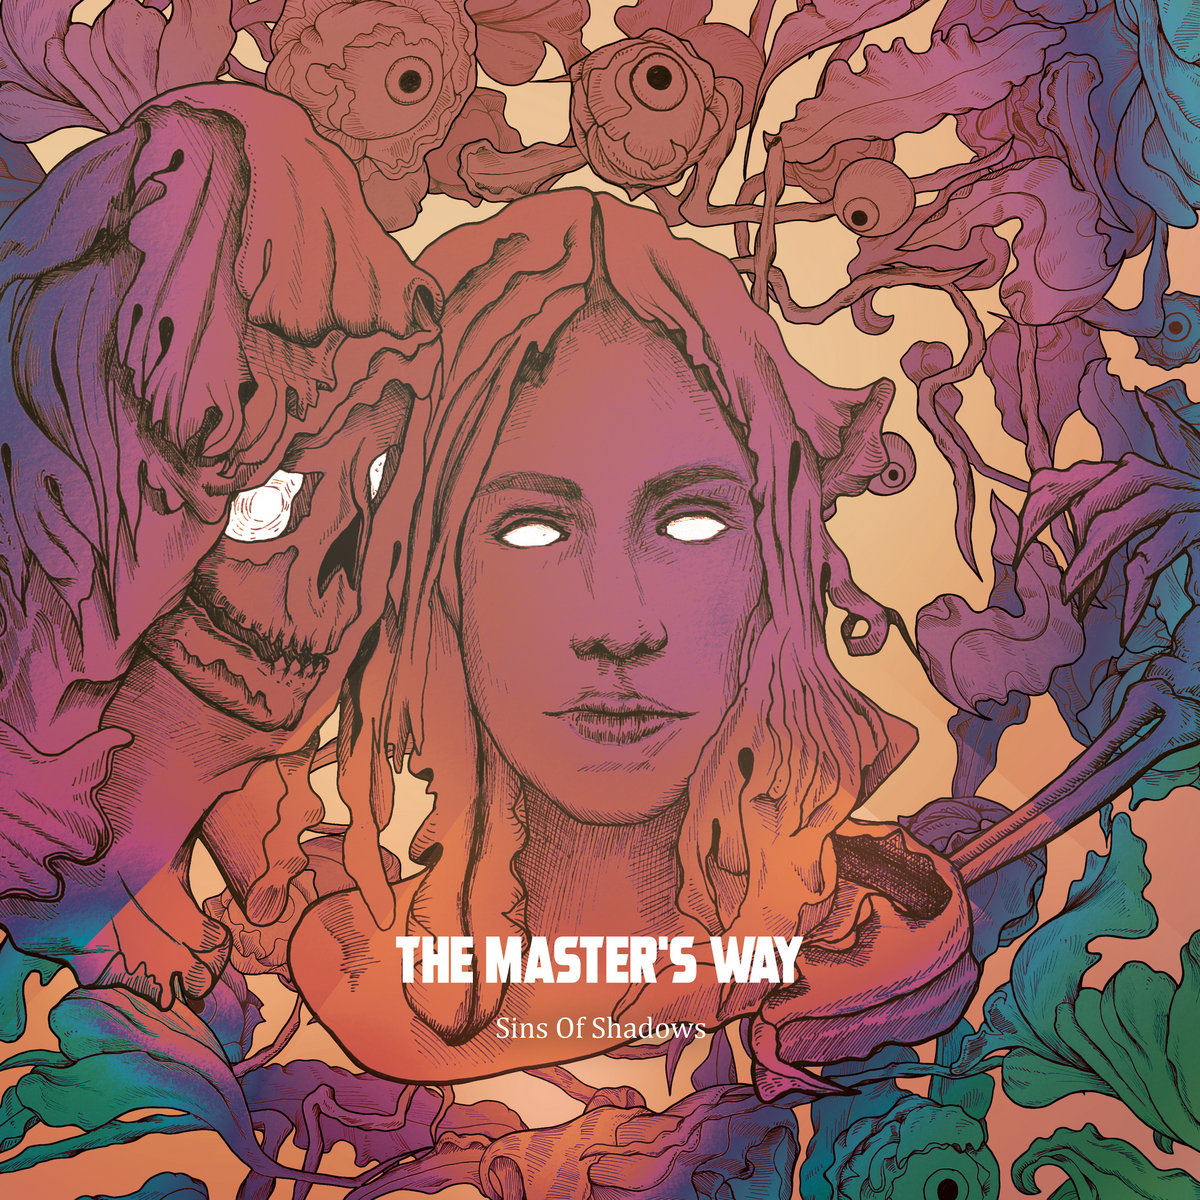 The Master's Way Sins Of Shadows Album Cover Artwork